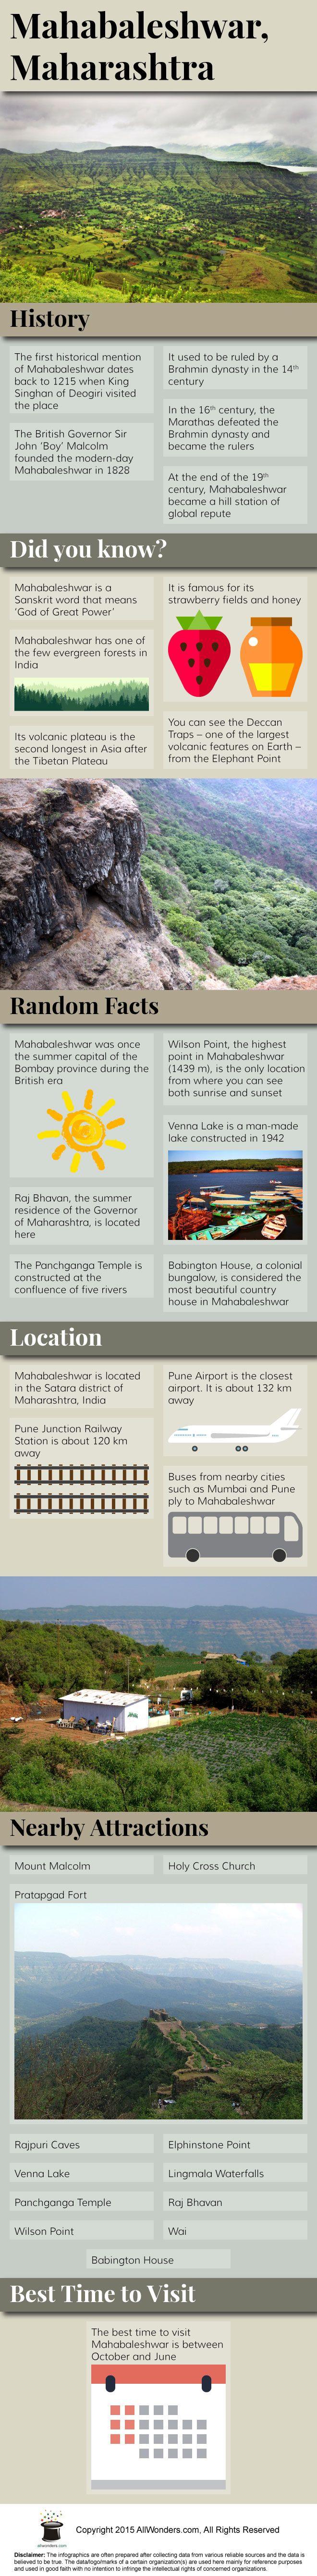 Mahabaleshwar Infographic